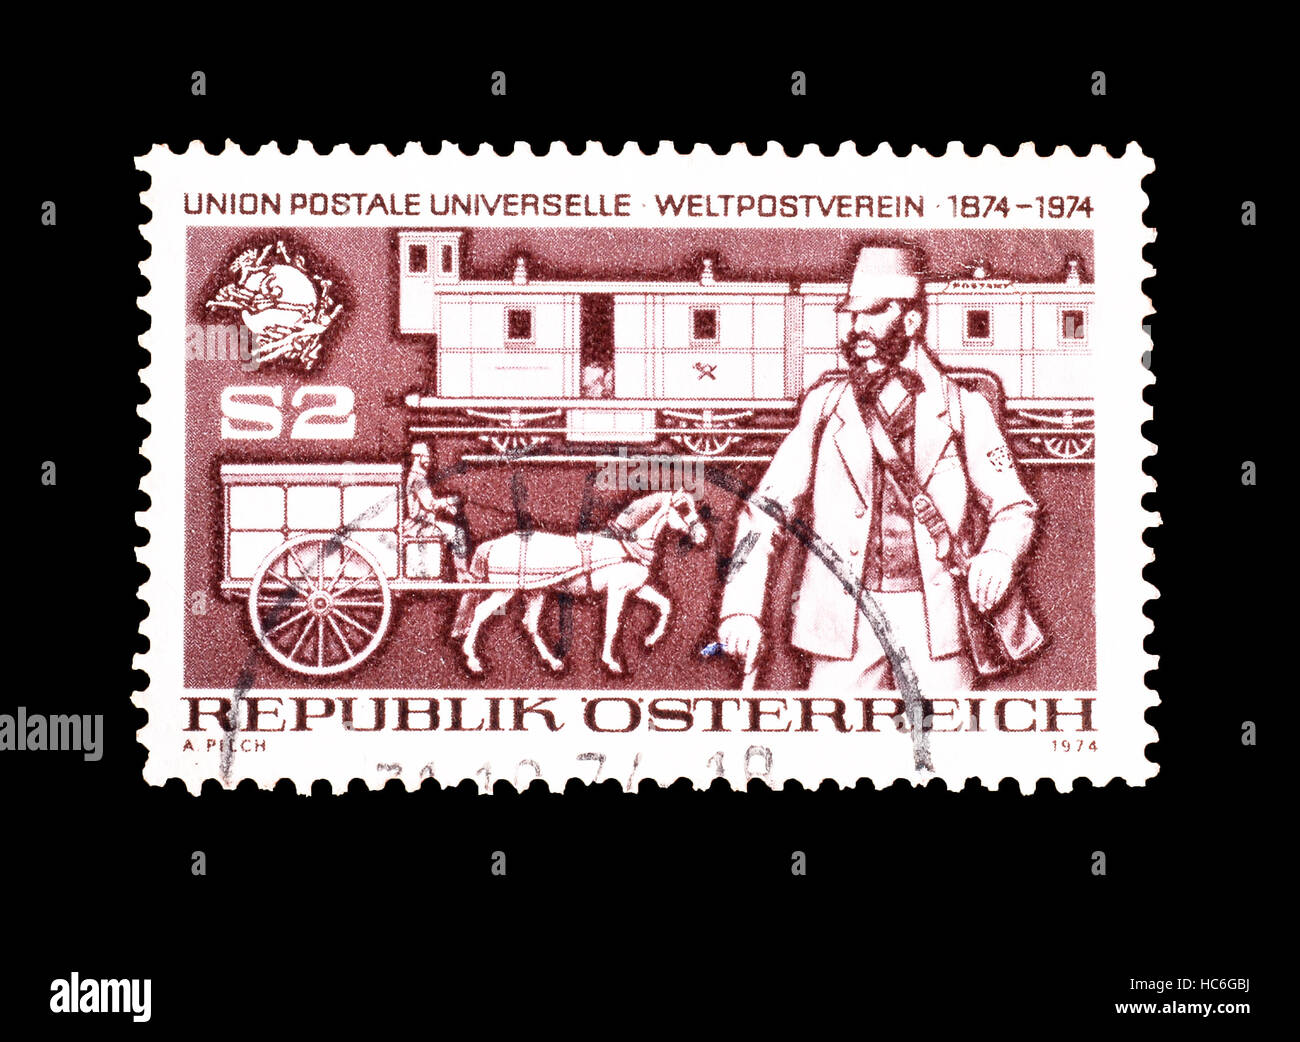 Austria Stamp 1974 Stock Photo 127993030